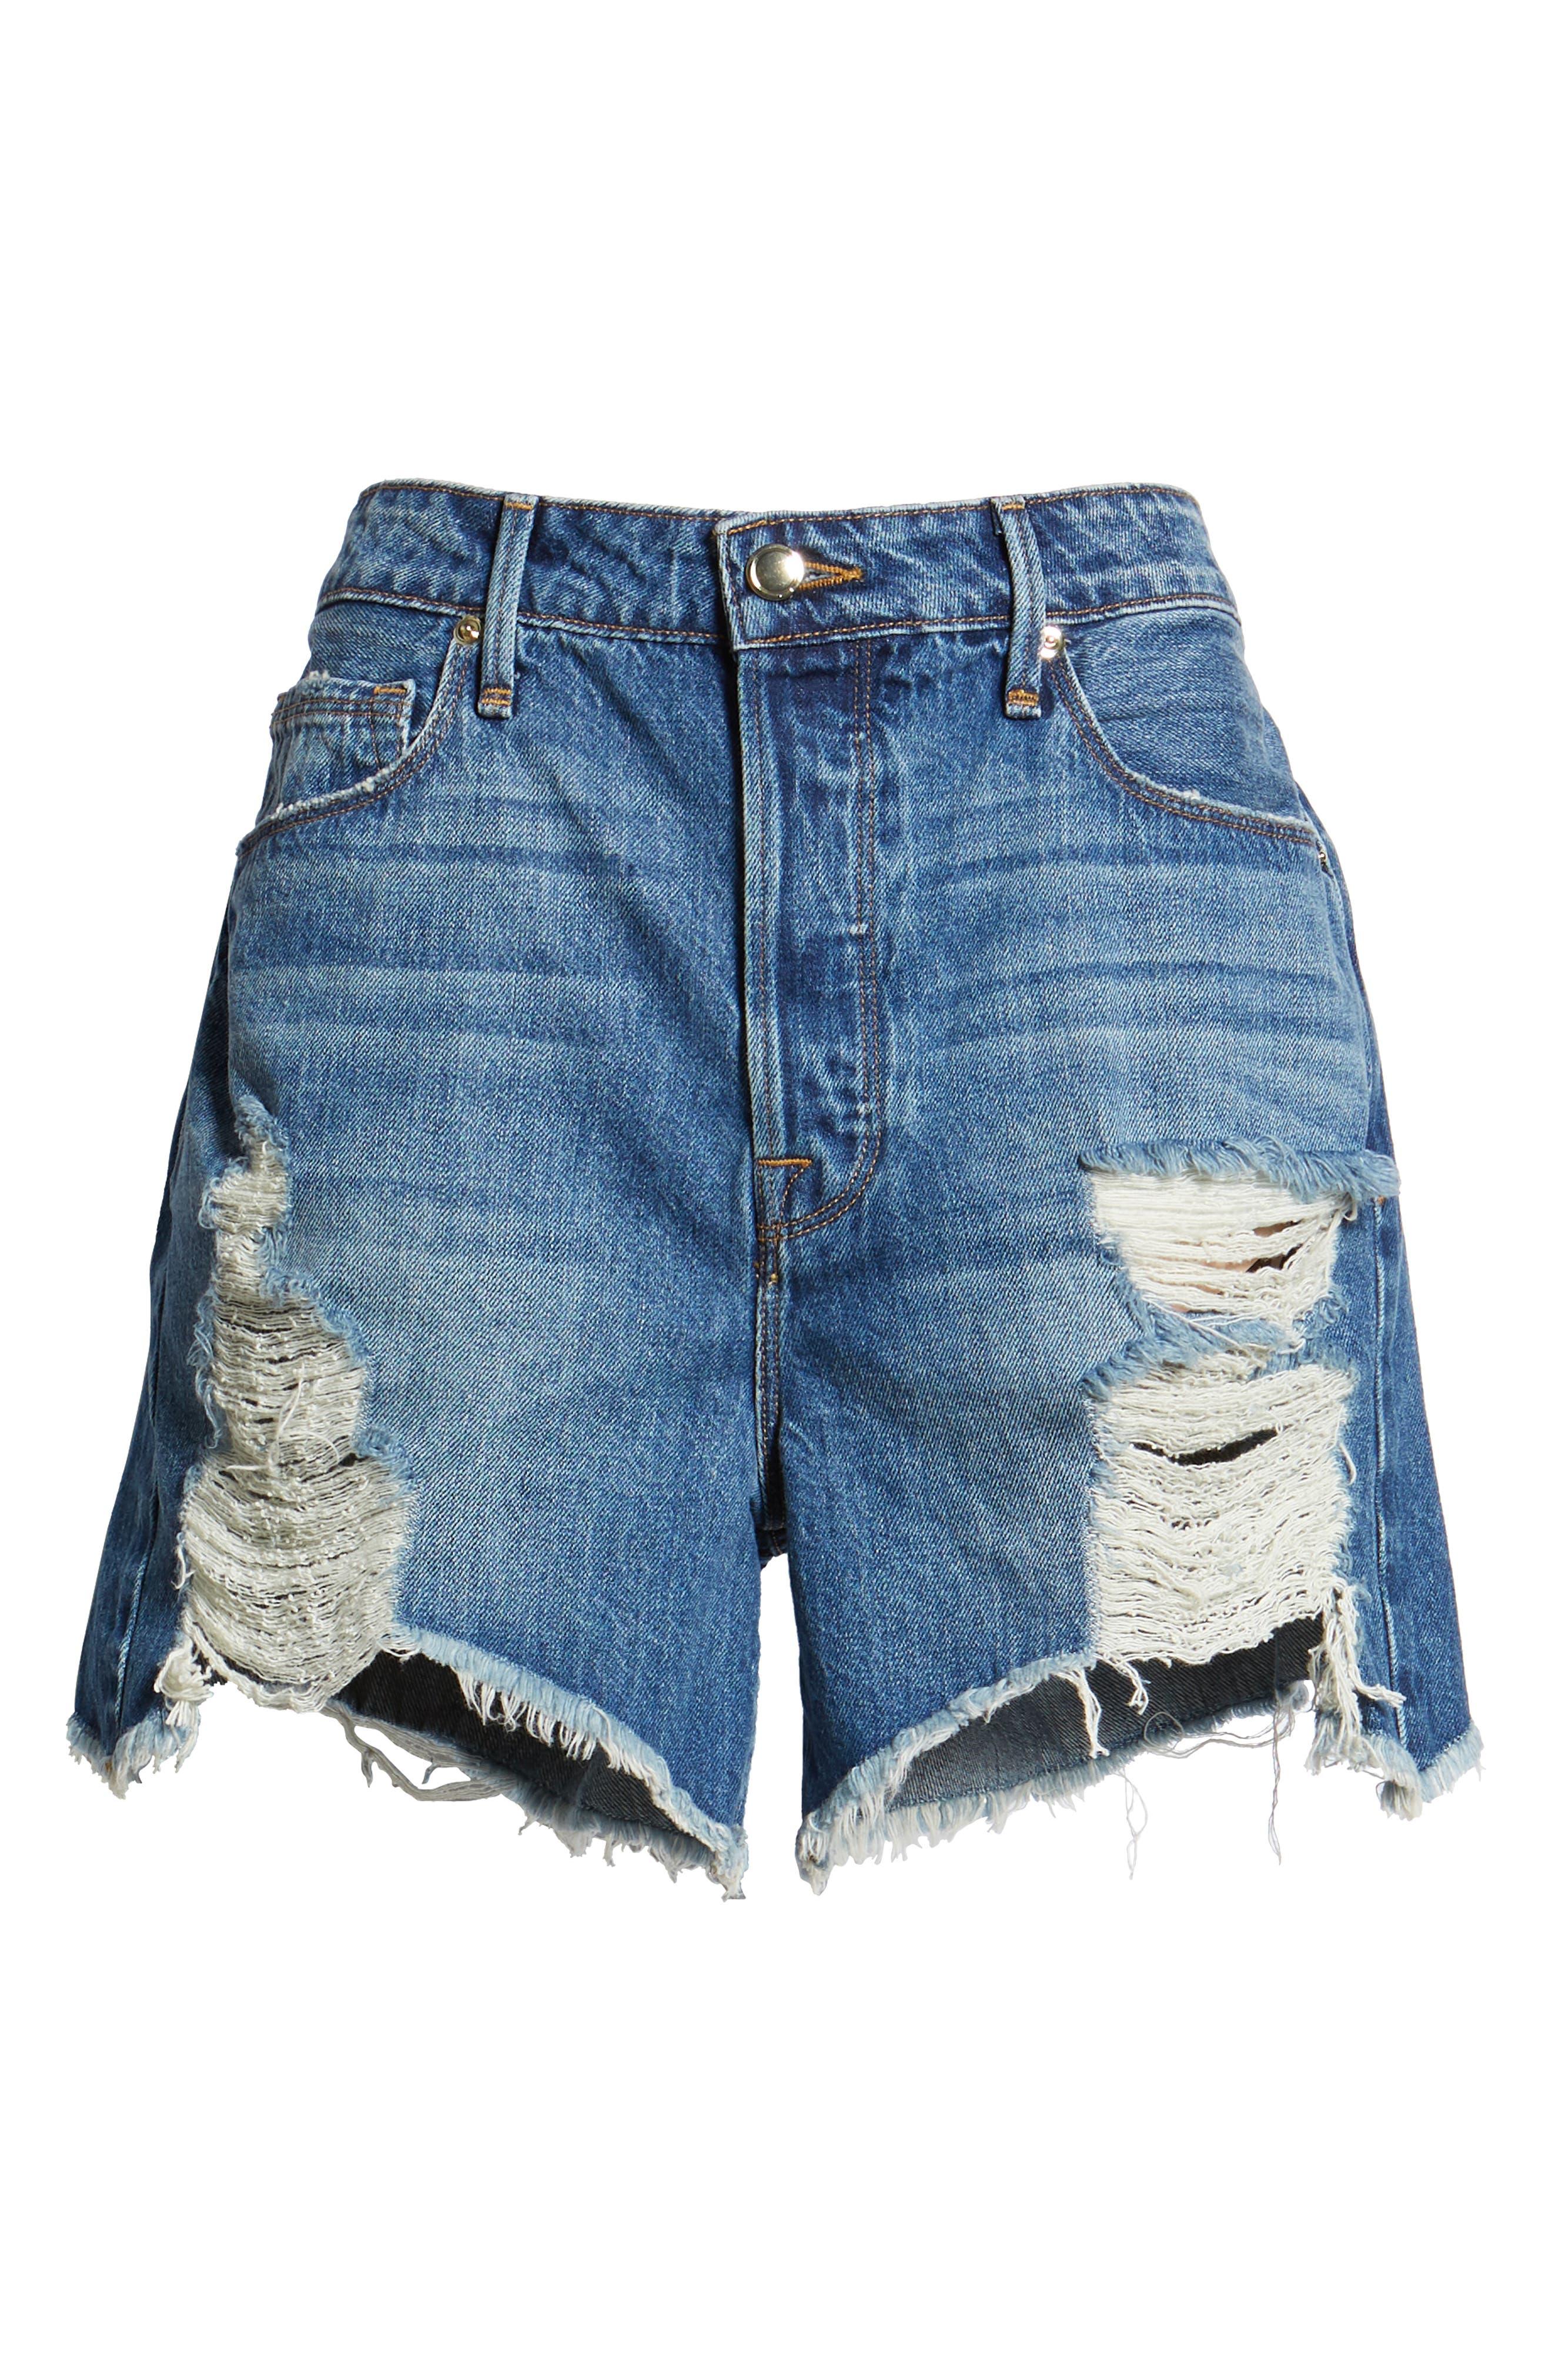 Bombshell High Waist Cutoff Denim Shorts,                             Alternate thumbnail 6, color,                             BLUE153